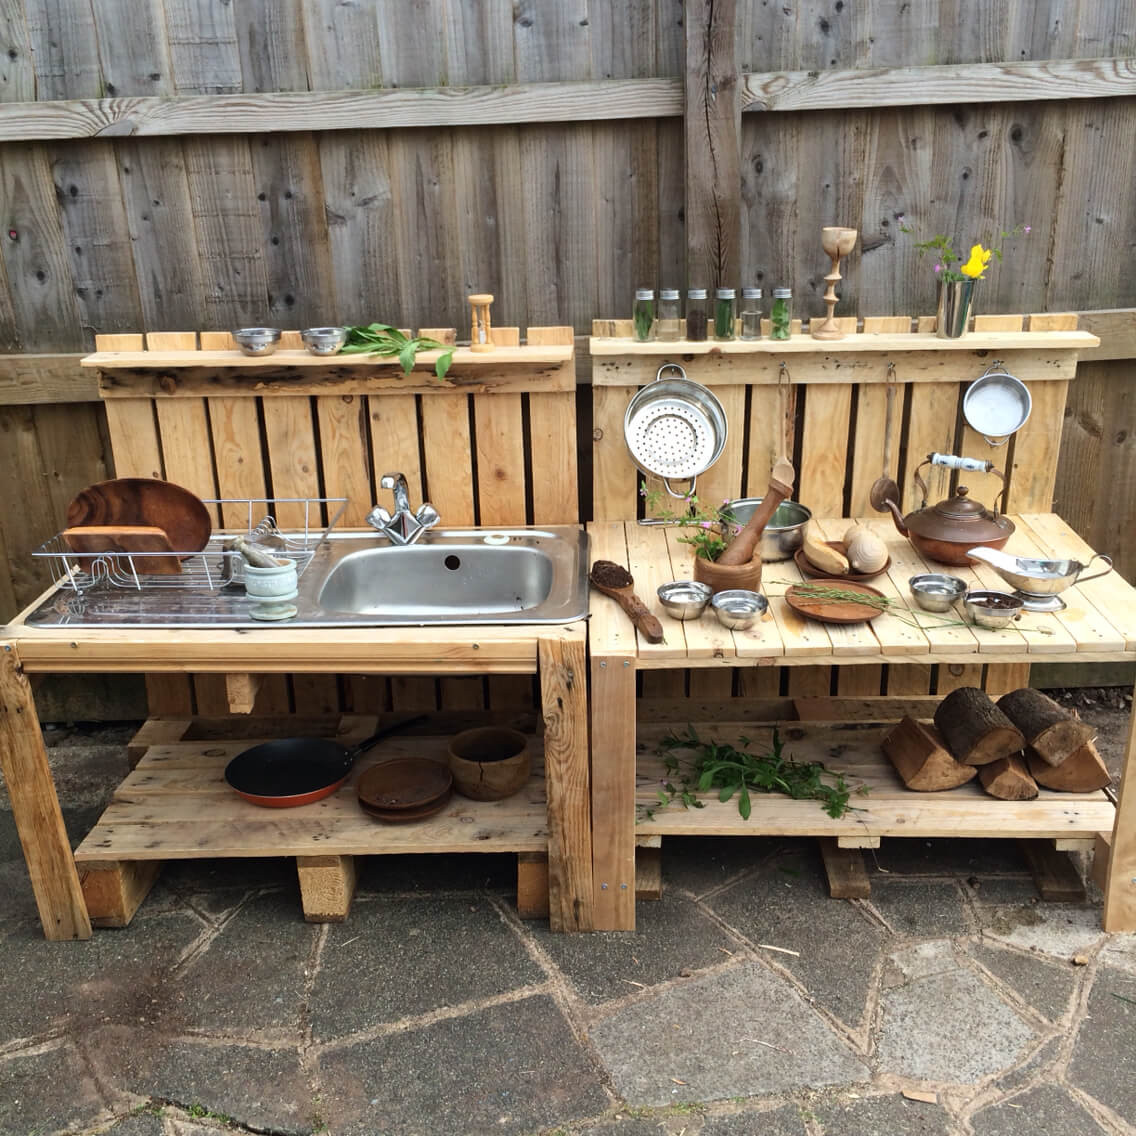 Diy Outdoor Kitchen Ideas  27 Amazing Outdoor Kitchen Cabinets Ideas [Make Guests